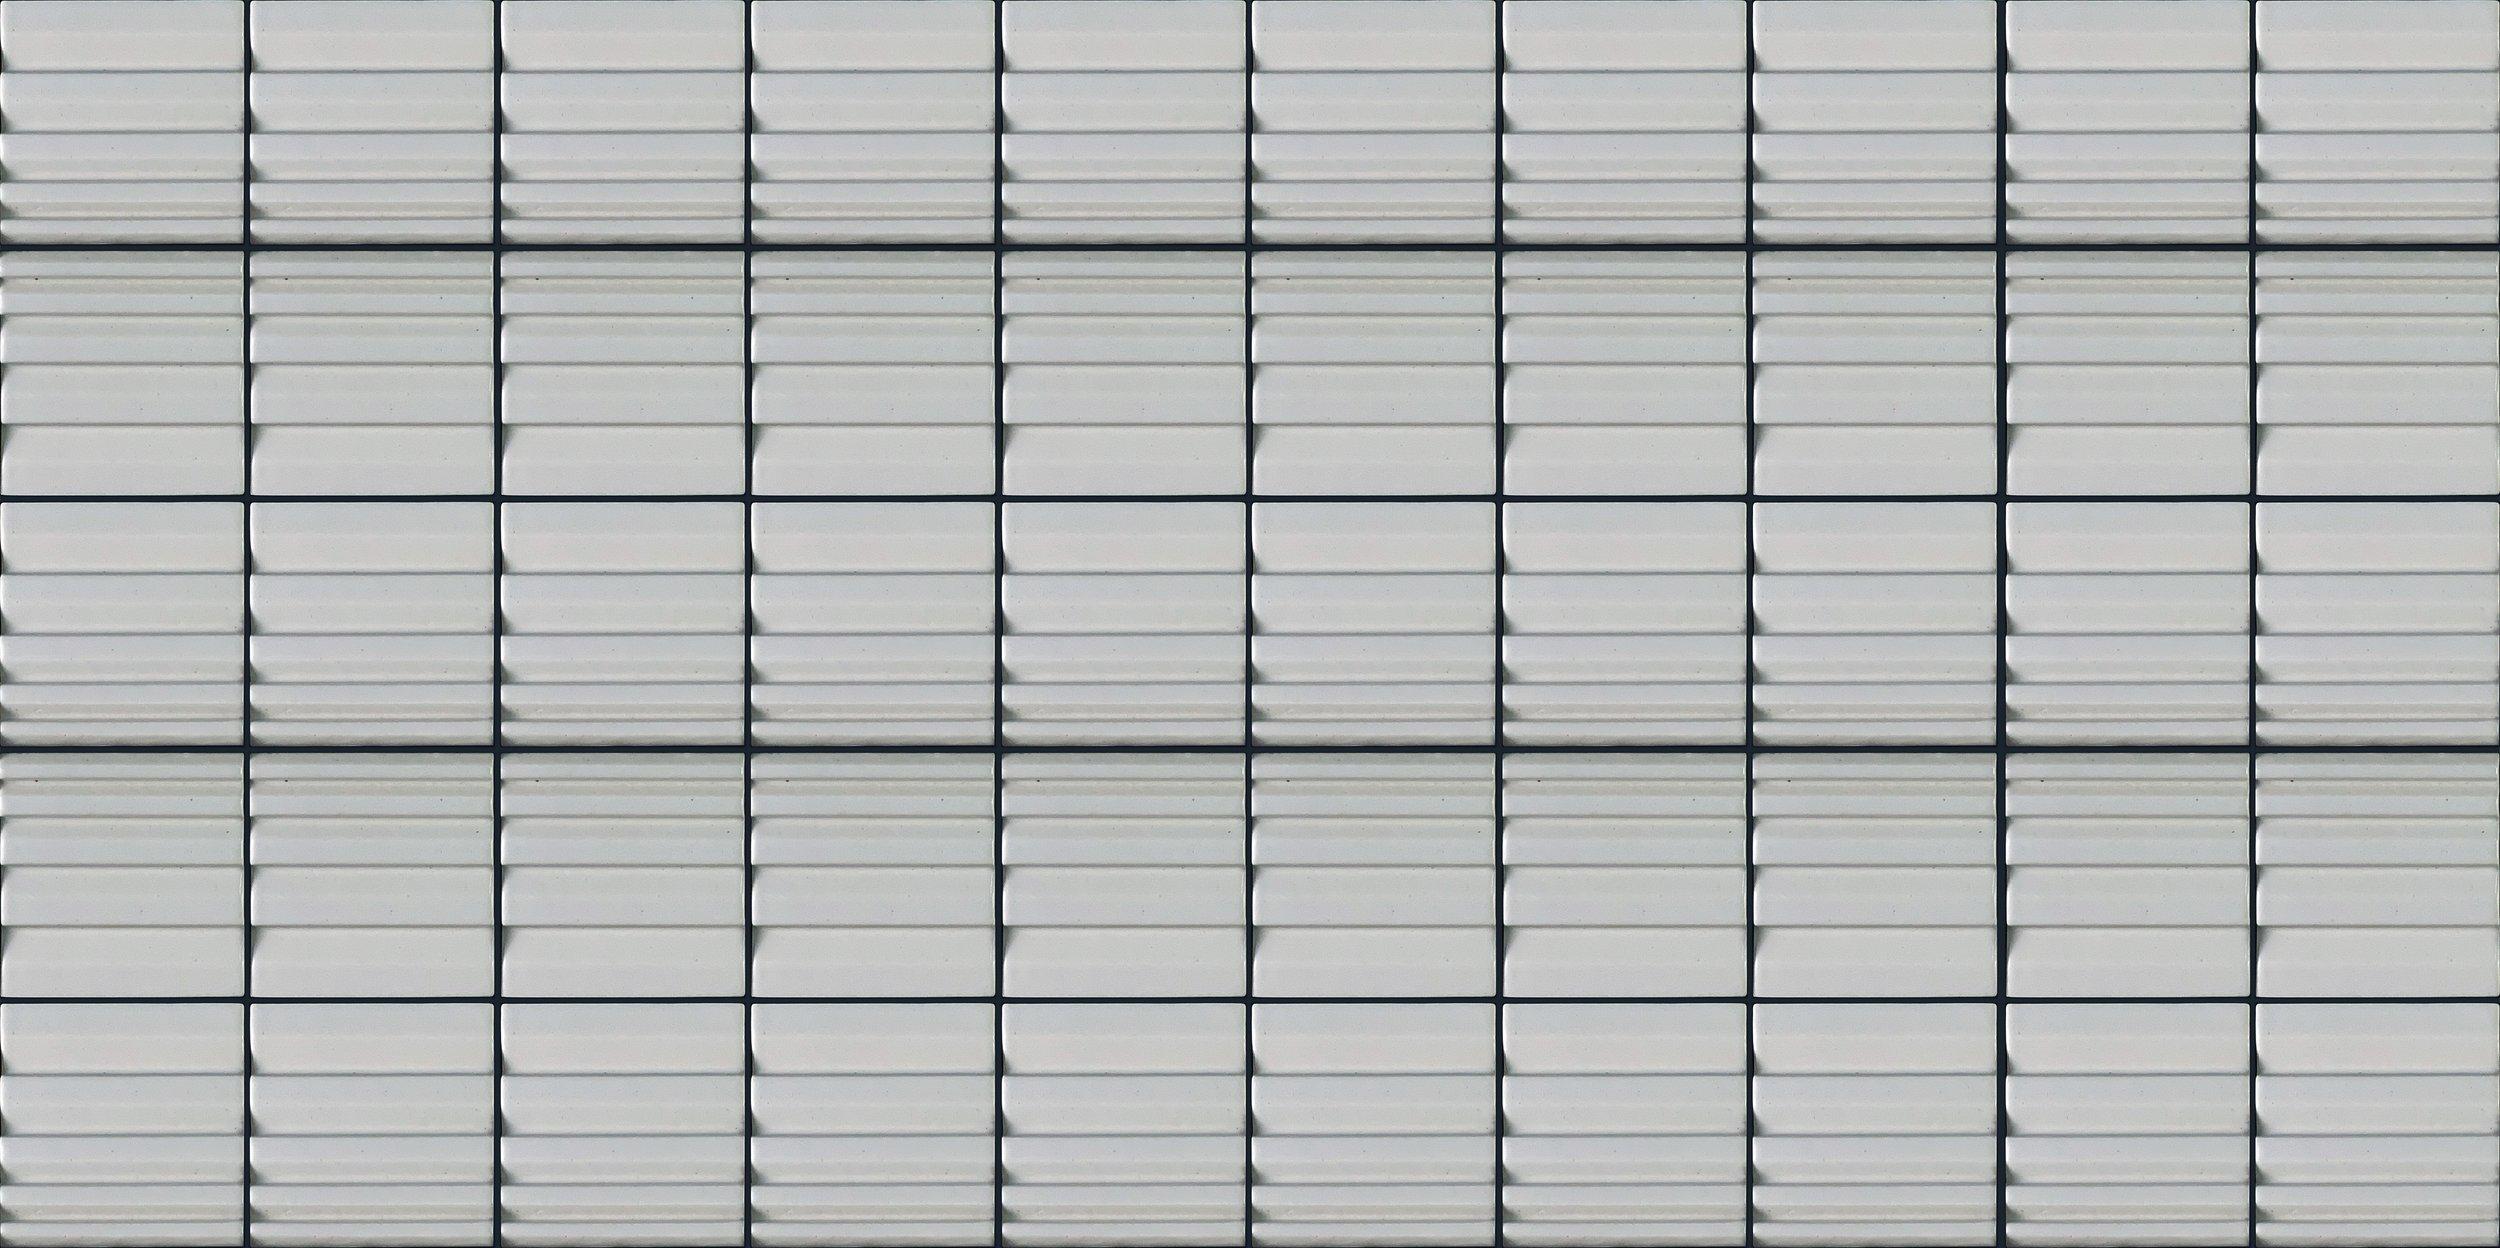 RF441 : Pattern A